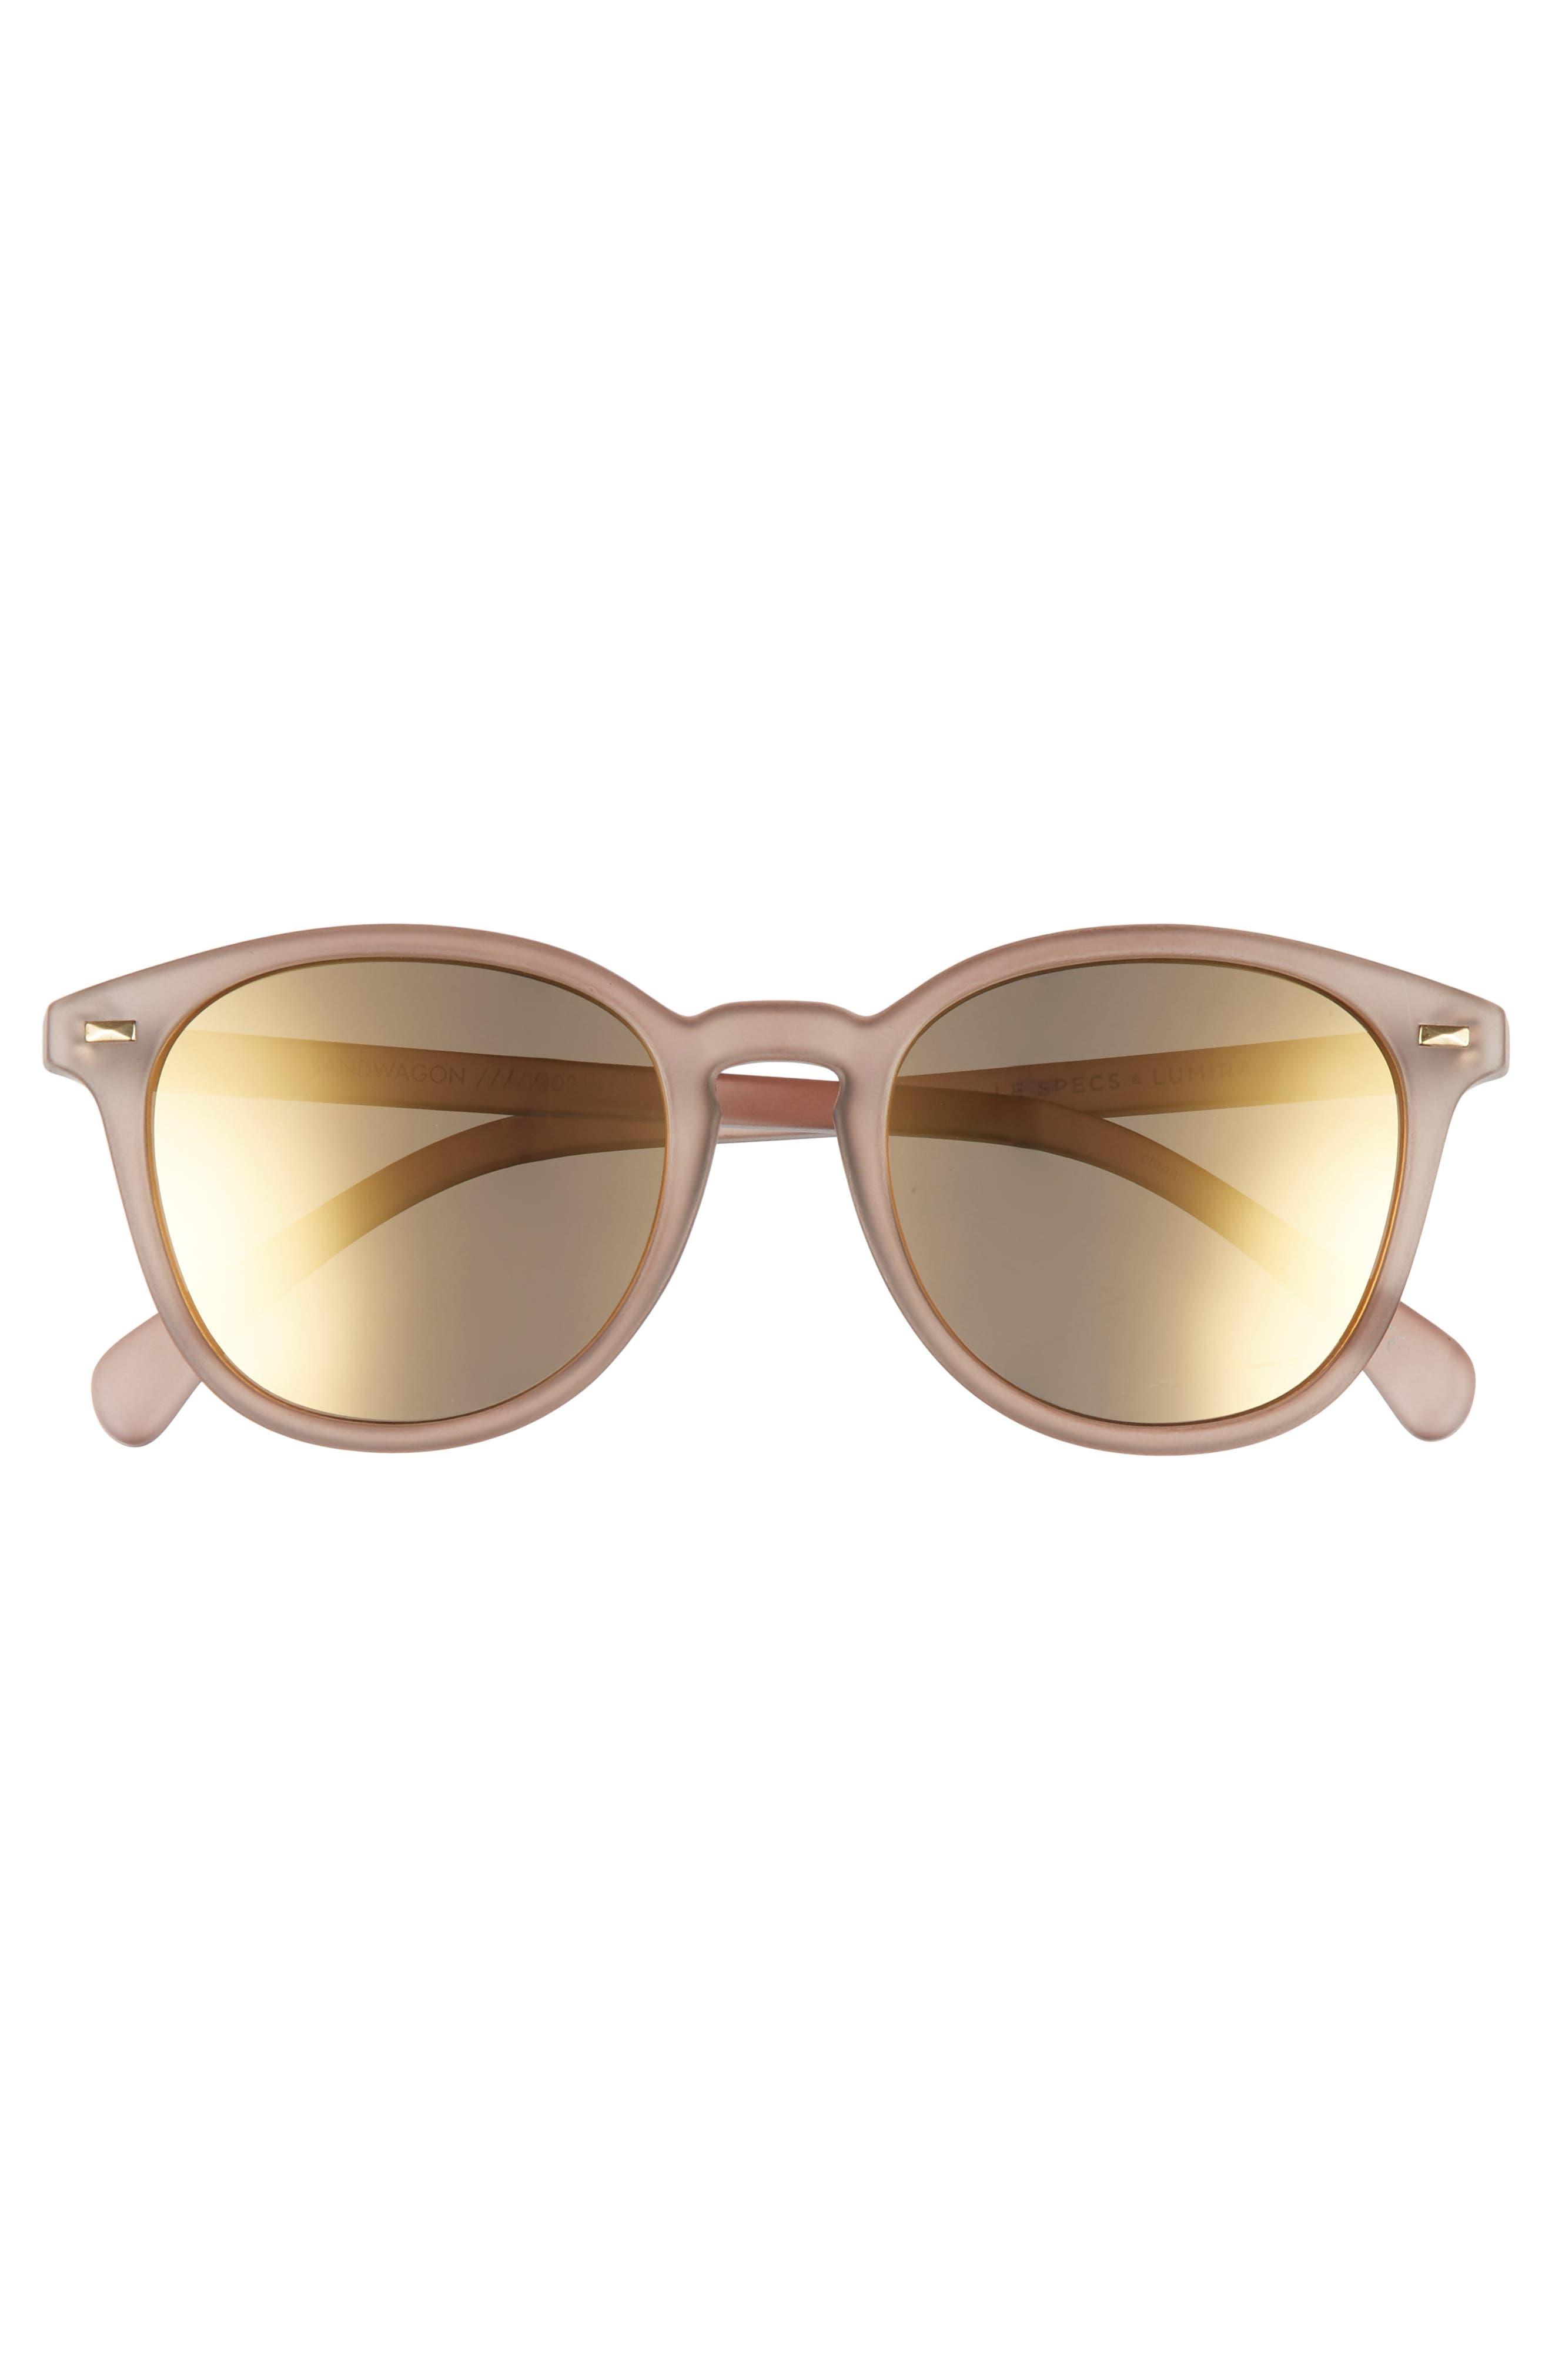 Alternate Image 4  - Le Specs x Lumira Bandwagon 51mm Sunglasses & Candle Gift Set